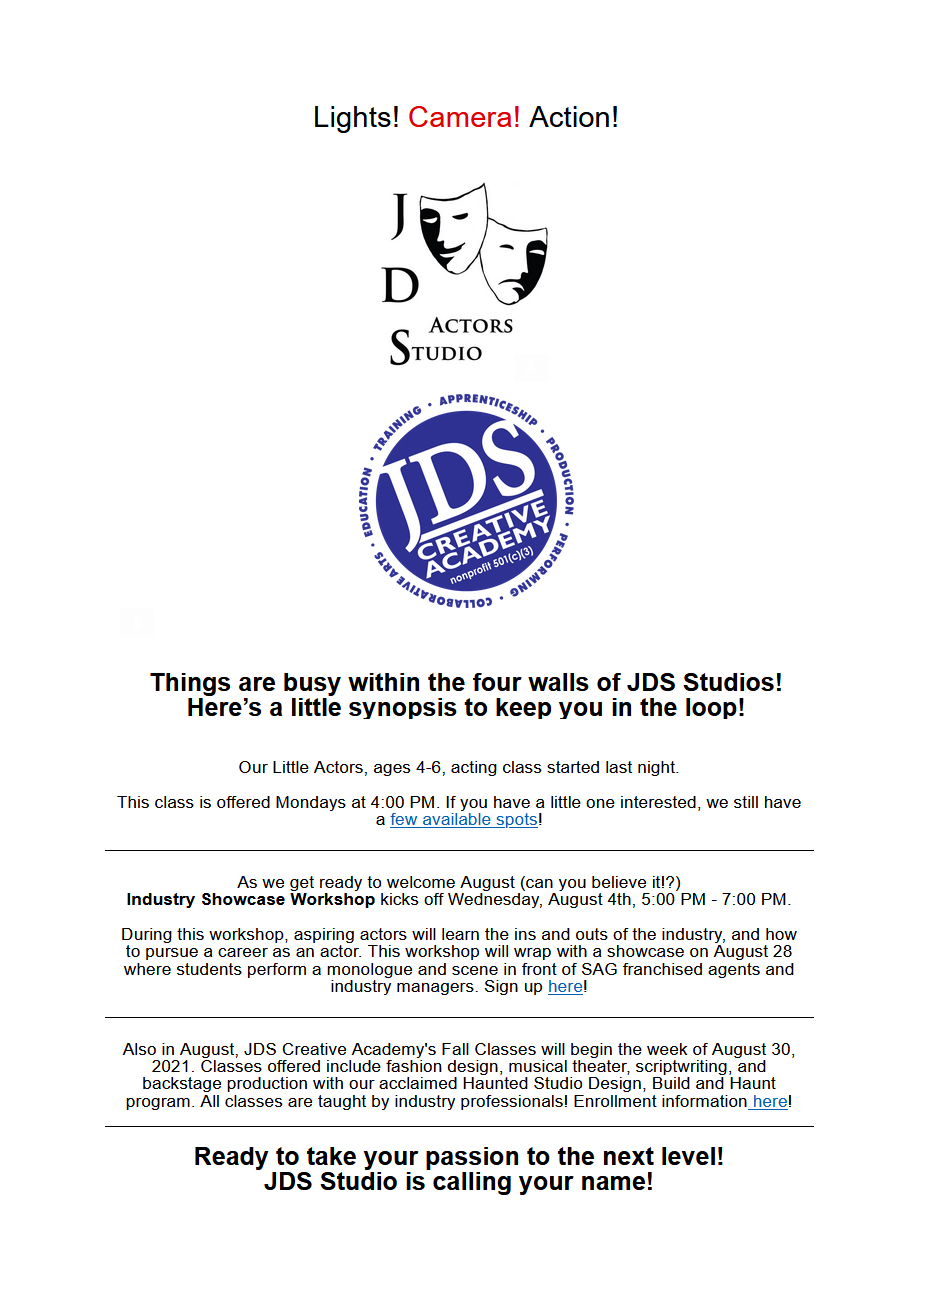 JDS Studio Update